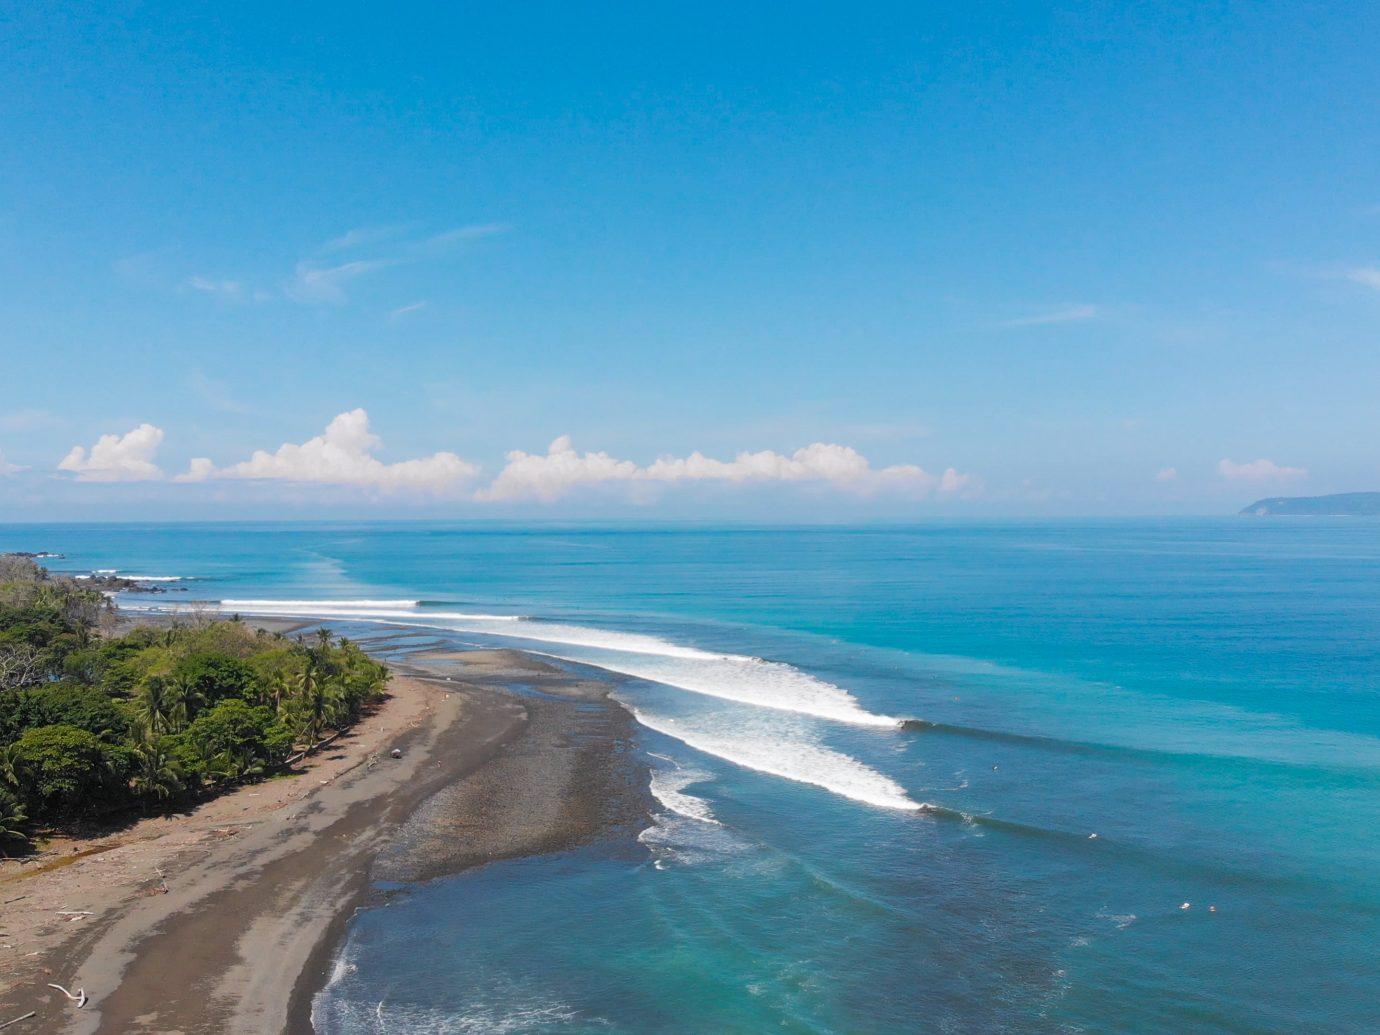 Pavones surfbreak, the 2nd longest left in the world